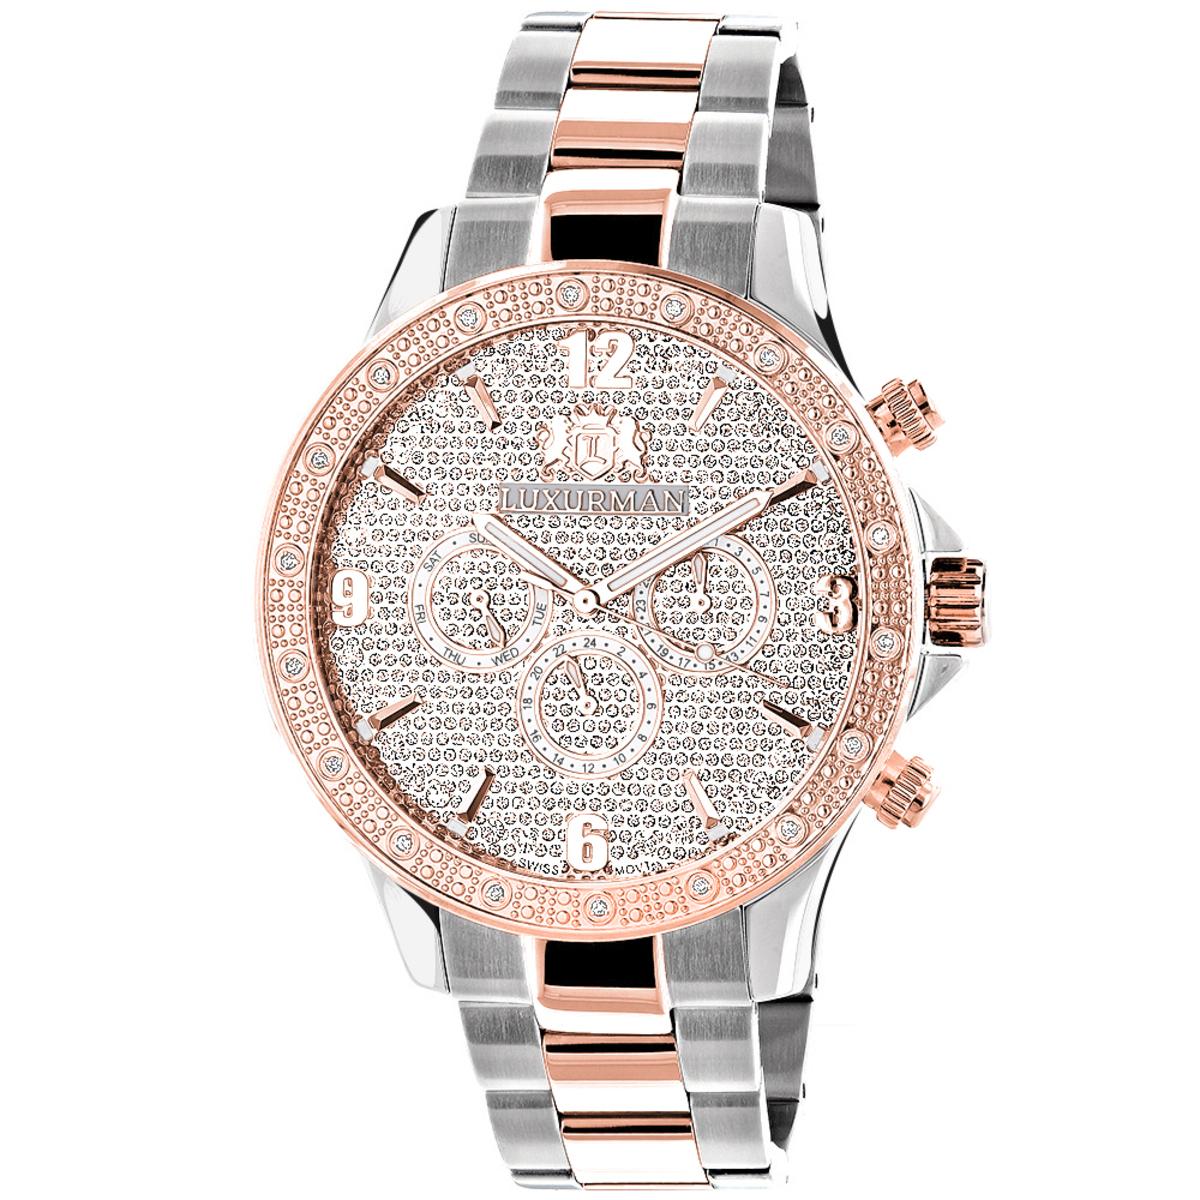 Luxurman Mens Diamond Watch Two-Tone White Rose Gold Pltd Liberty Swiss Mvt